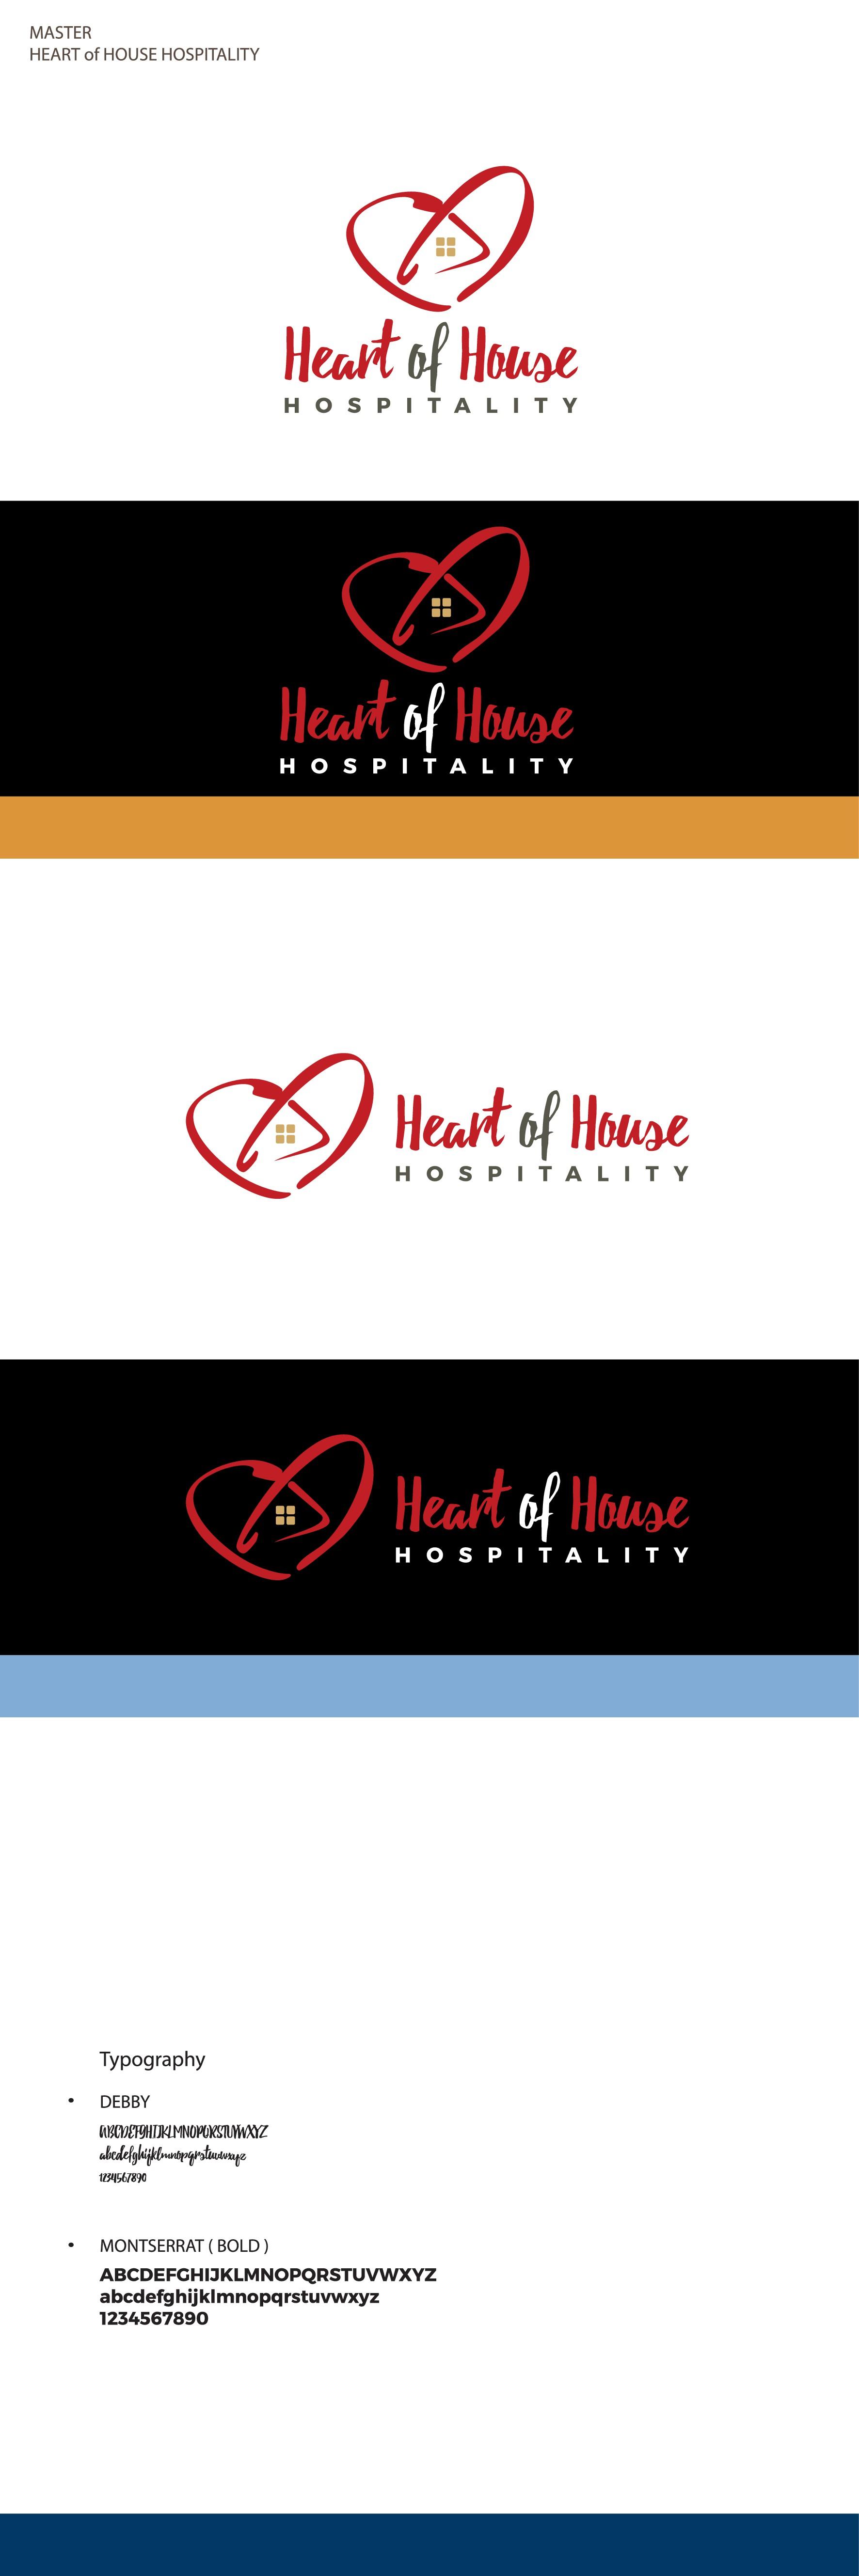 Design Logo for Heart of House Hospitality FB Group